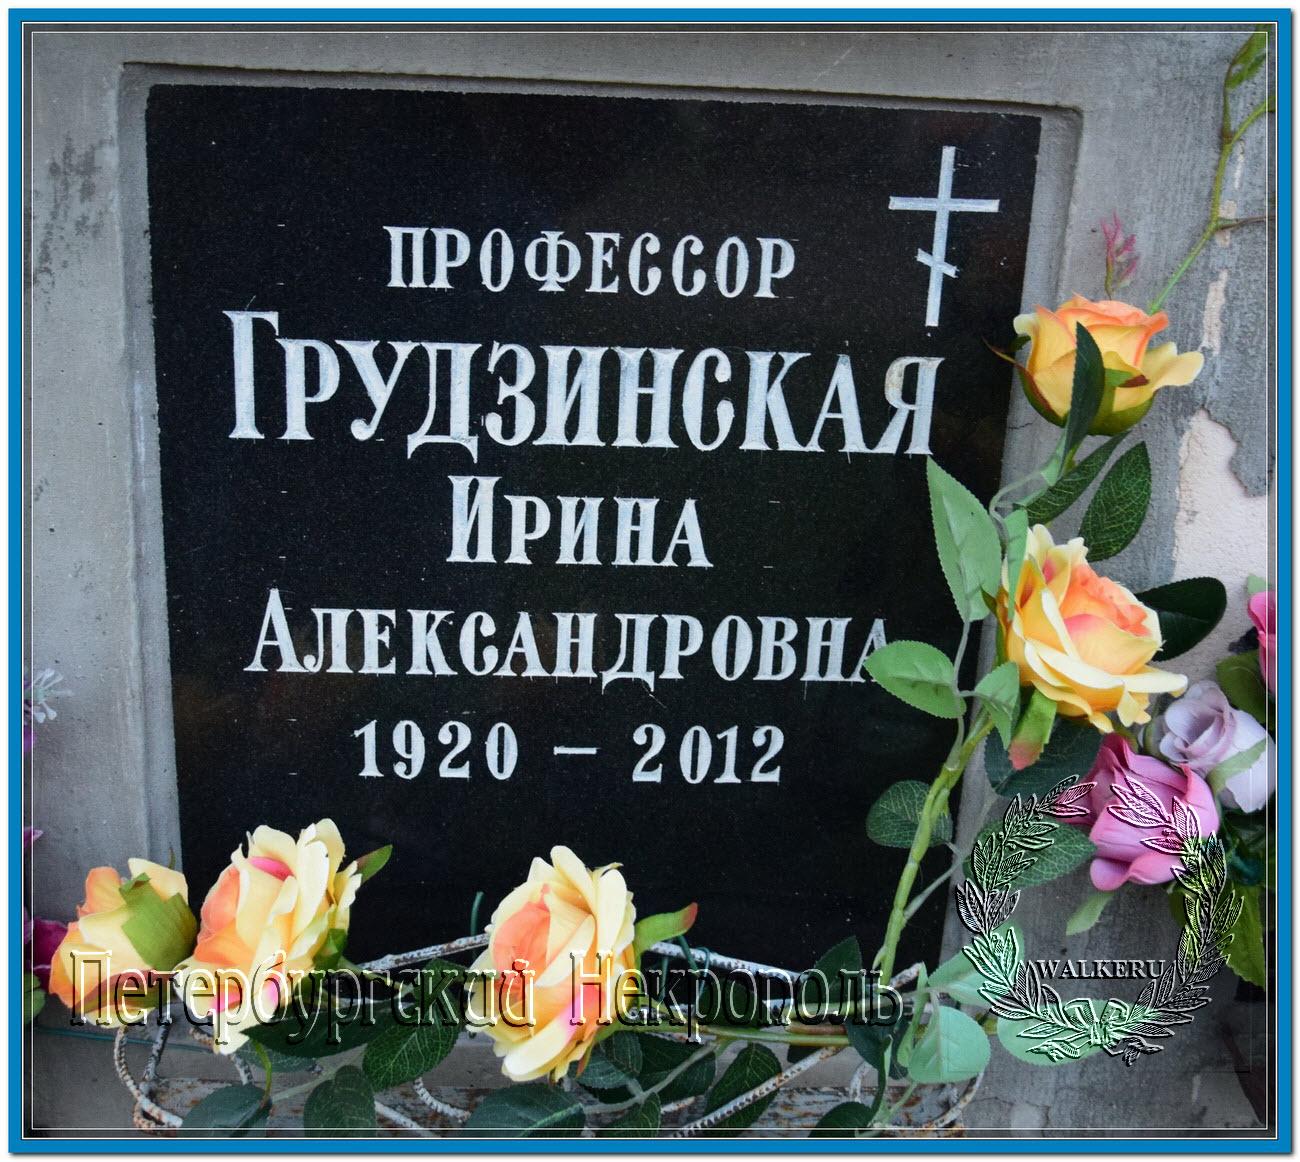 © Грудзинская Ирина Александровна